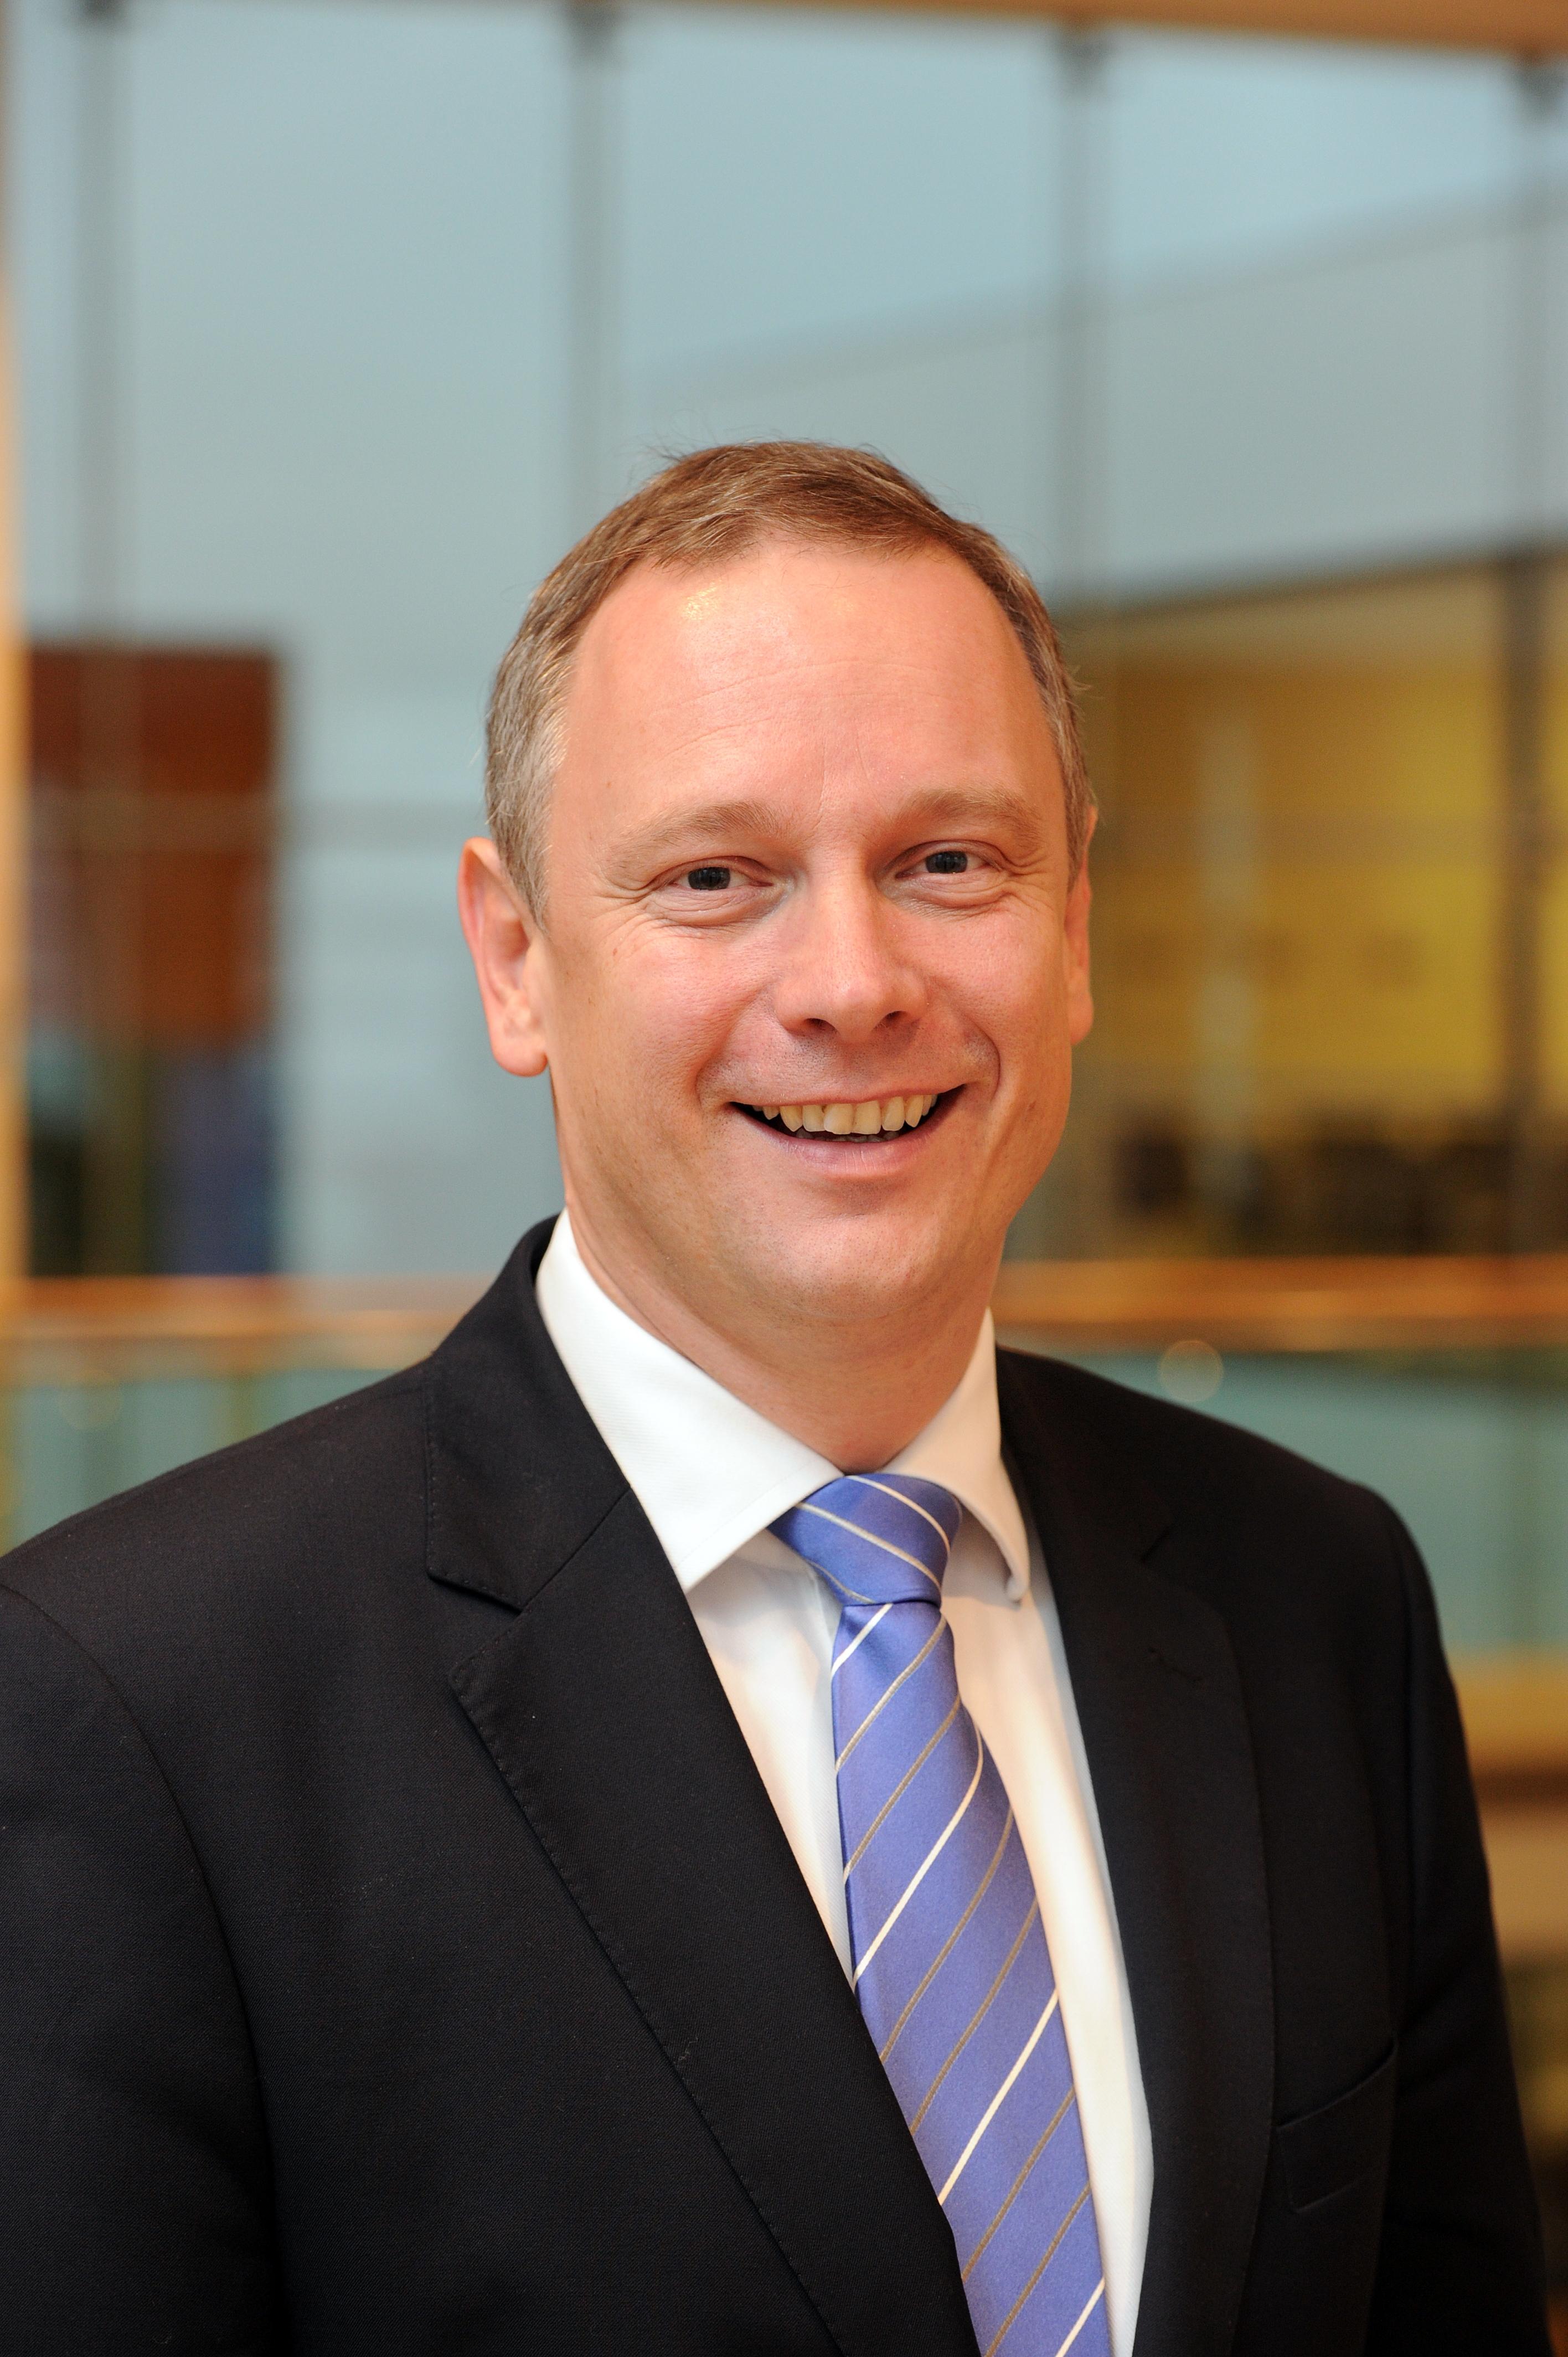 Georg Fahrenschon, DSGV-Präsident